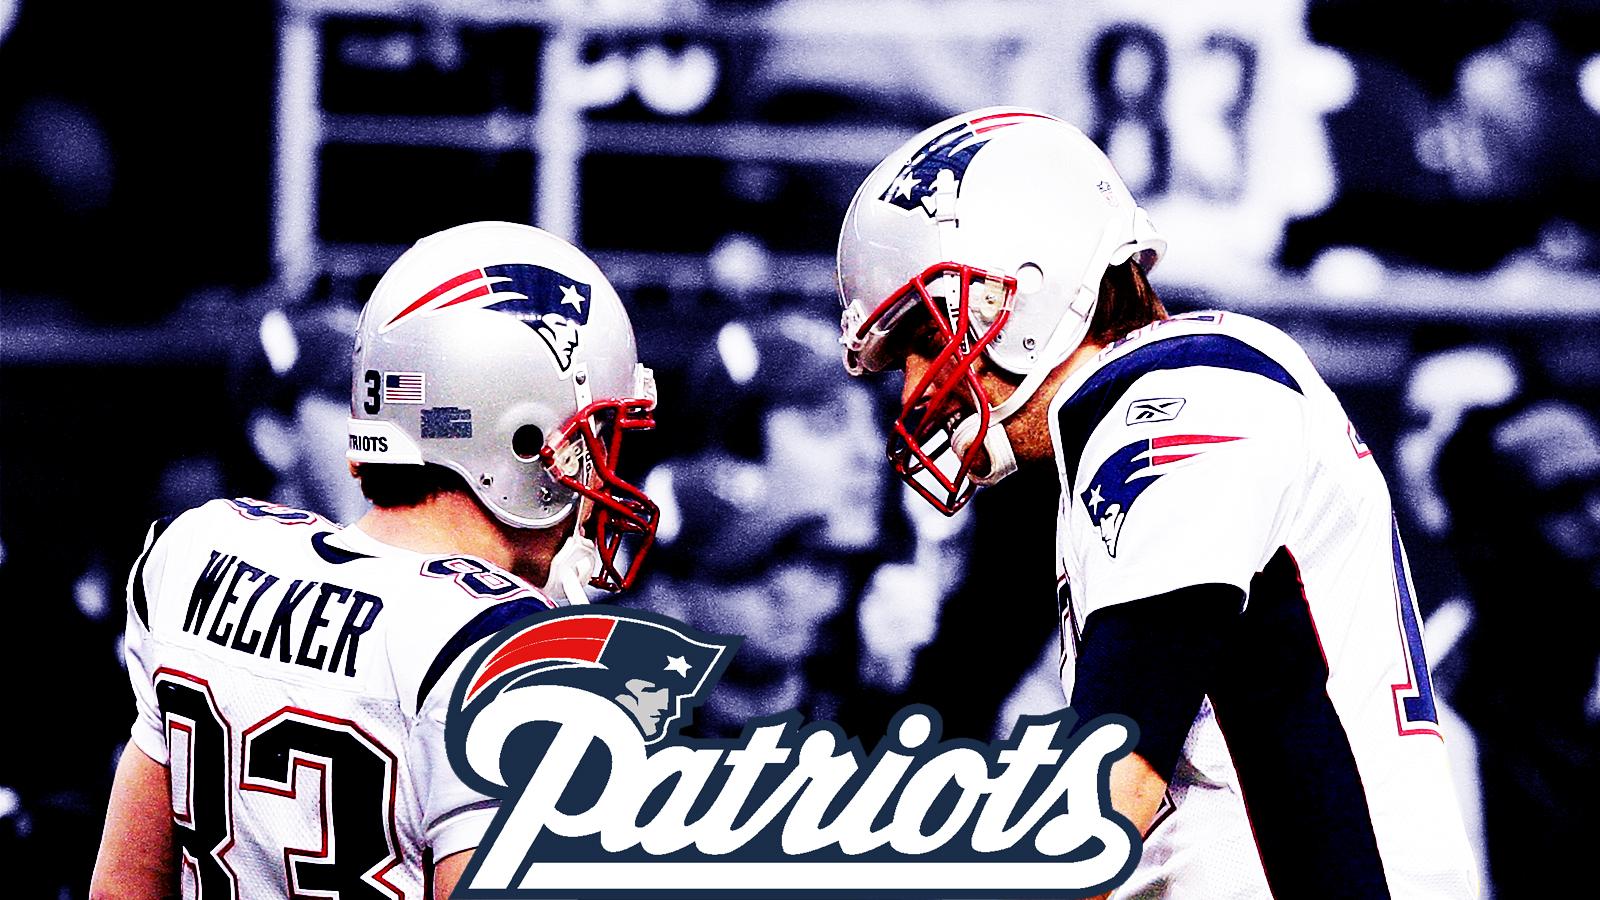 New England Patriots By Jason284 D2zw33f - New England Patriot Wallpaper Hd - HD Wallpaper